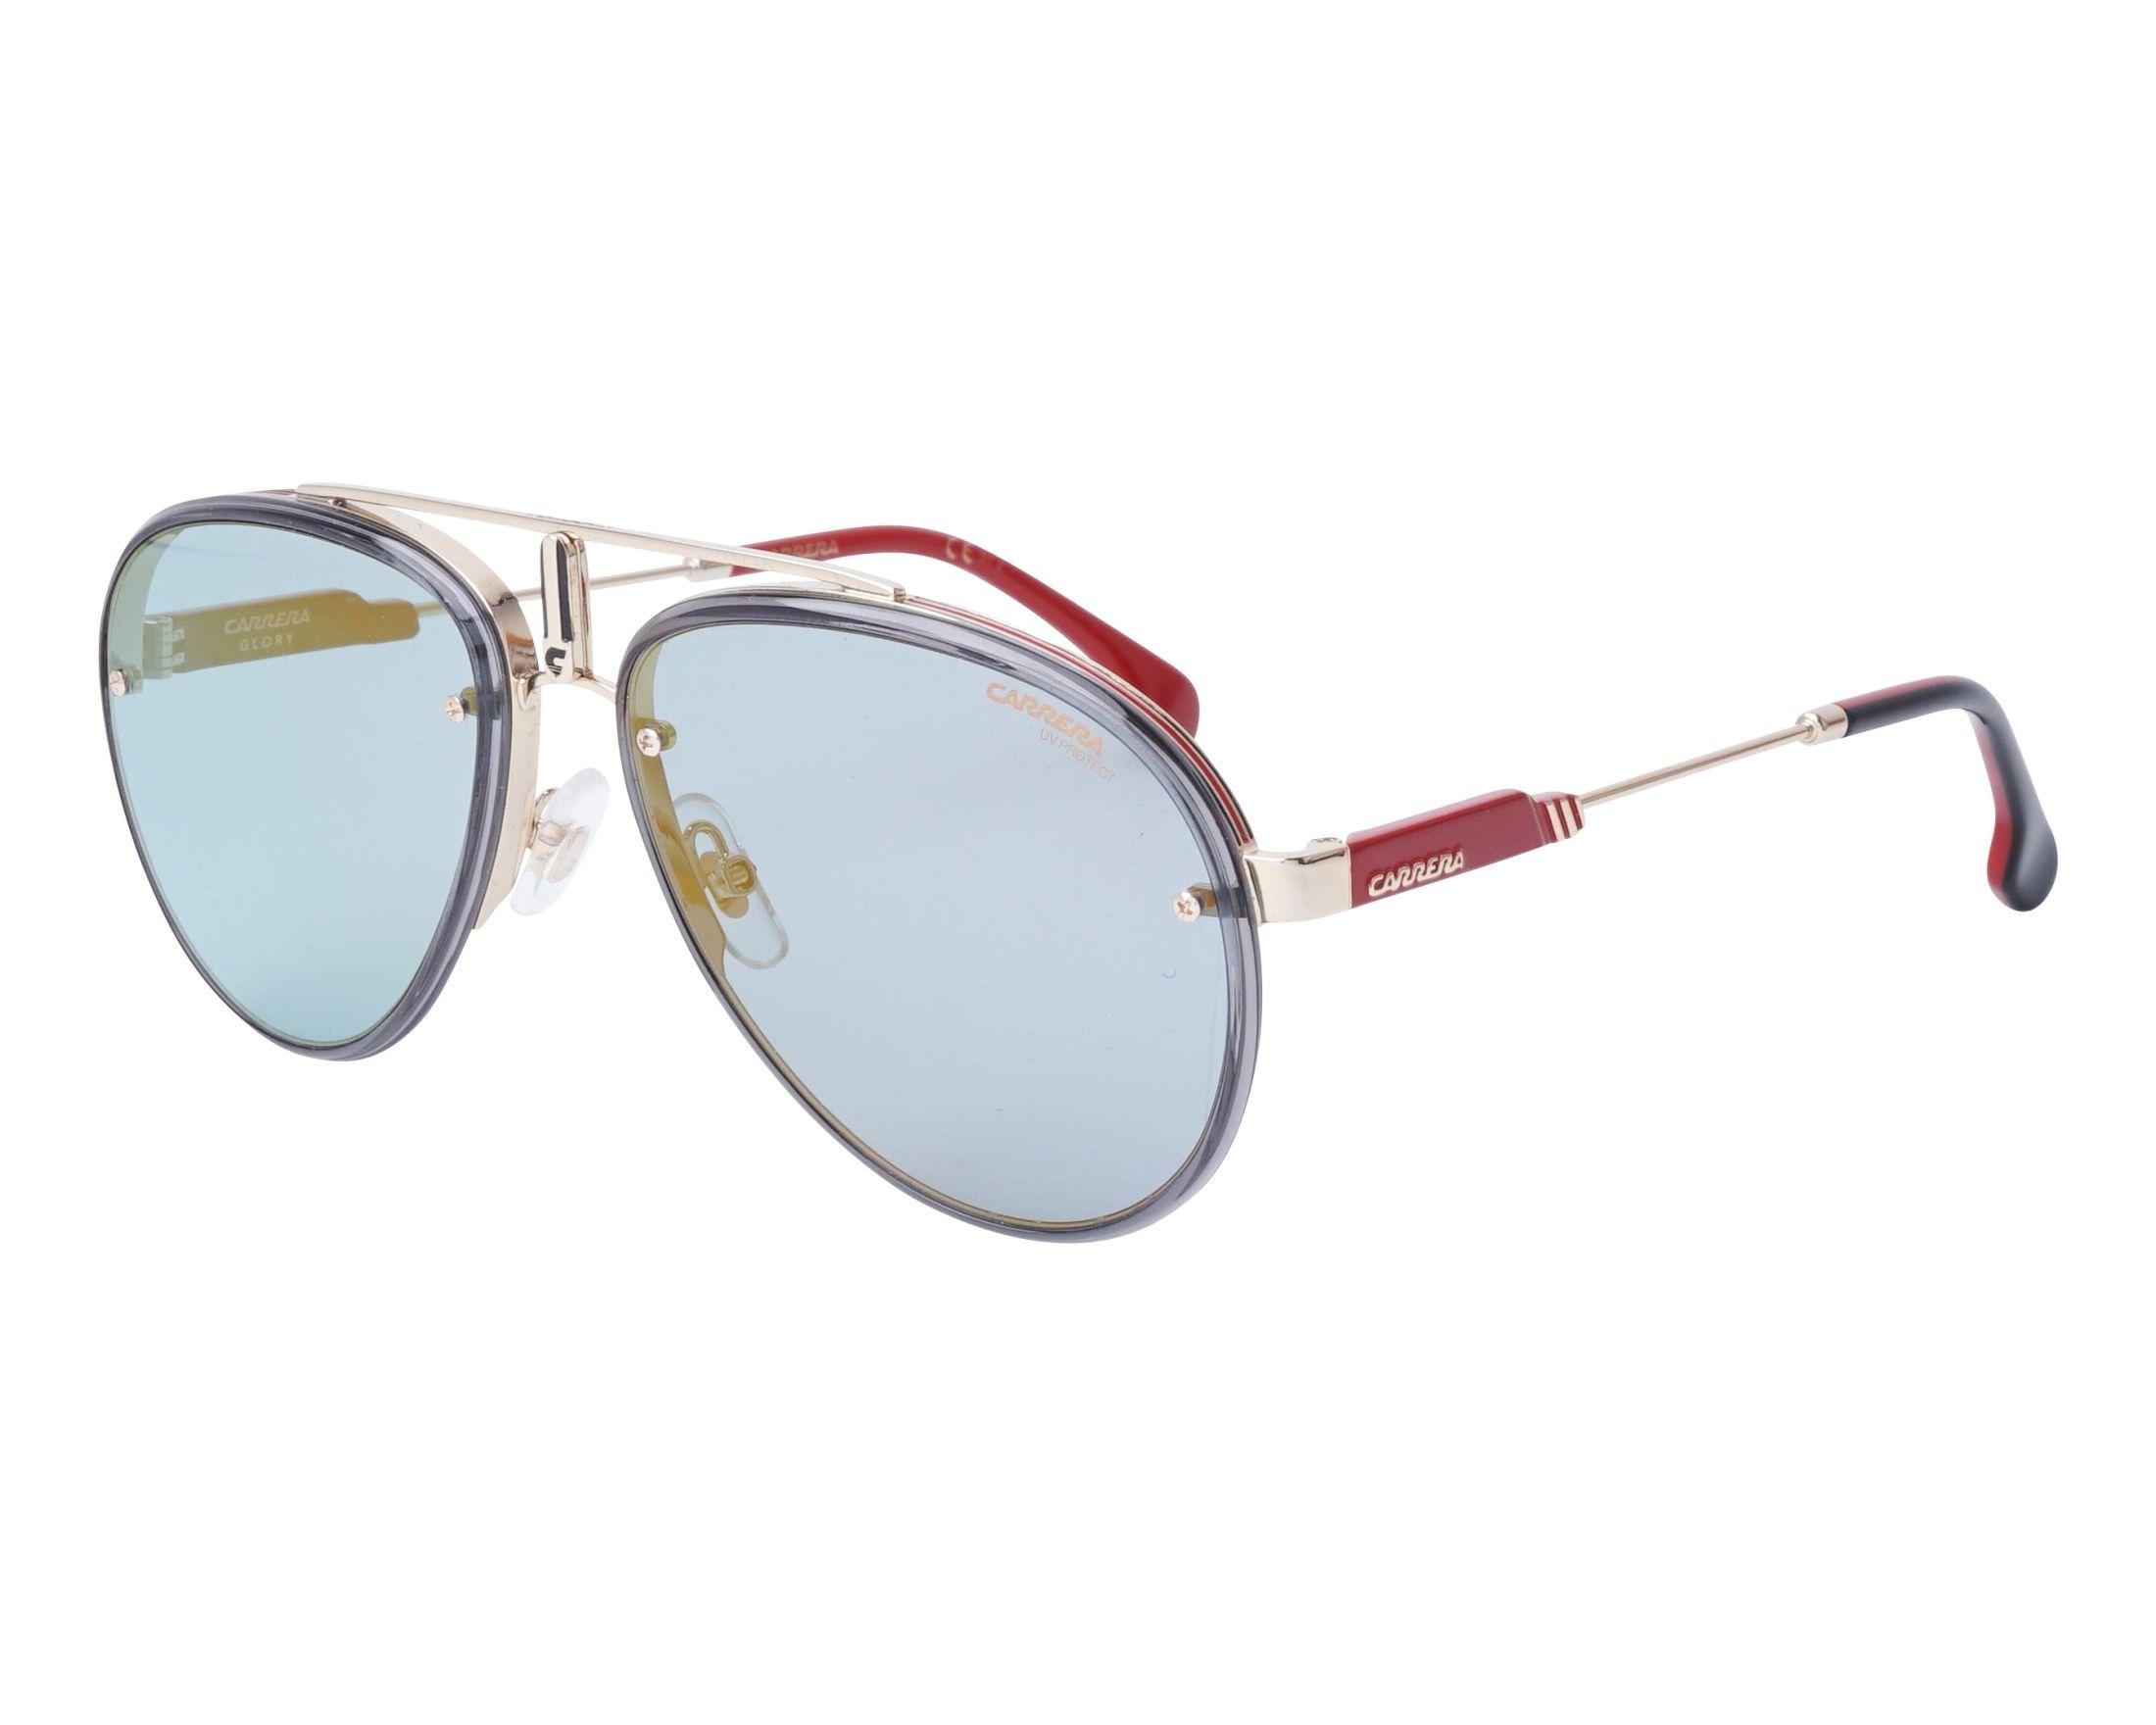 Sunglasses Carrera GLORY LKS2Y 58-17 Gold Grey profile view ca6aed5d4cc